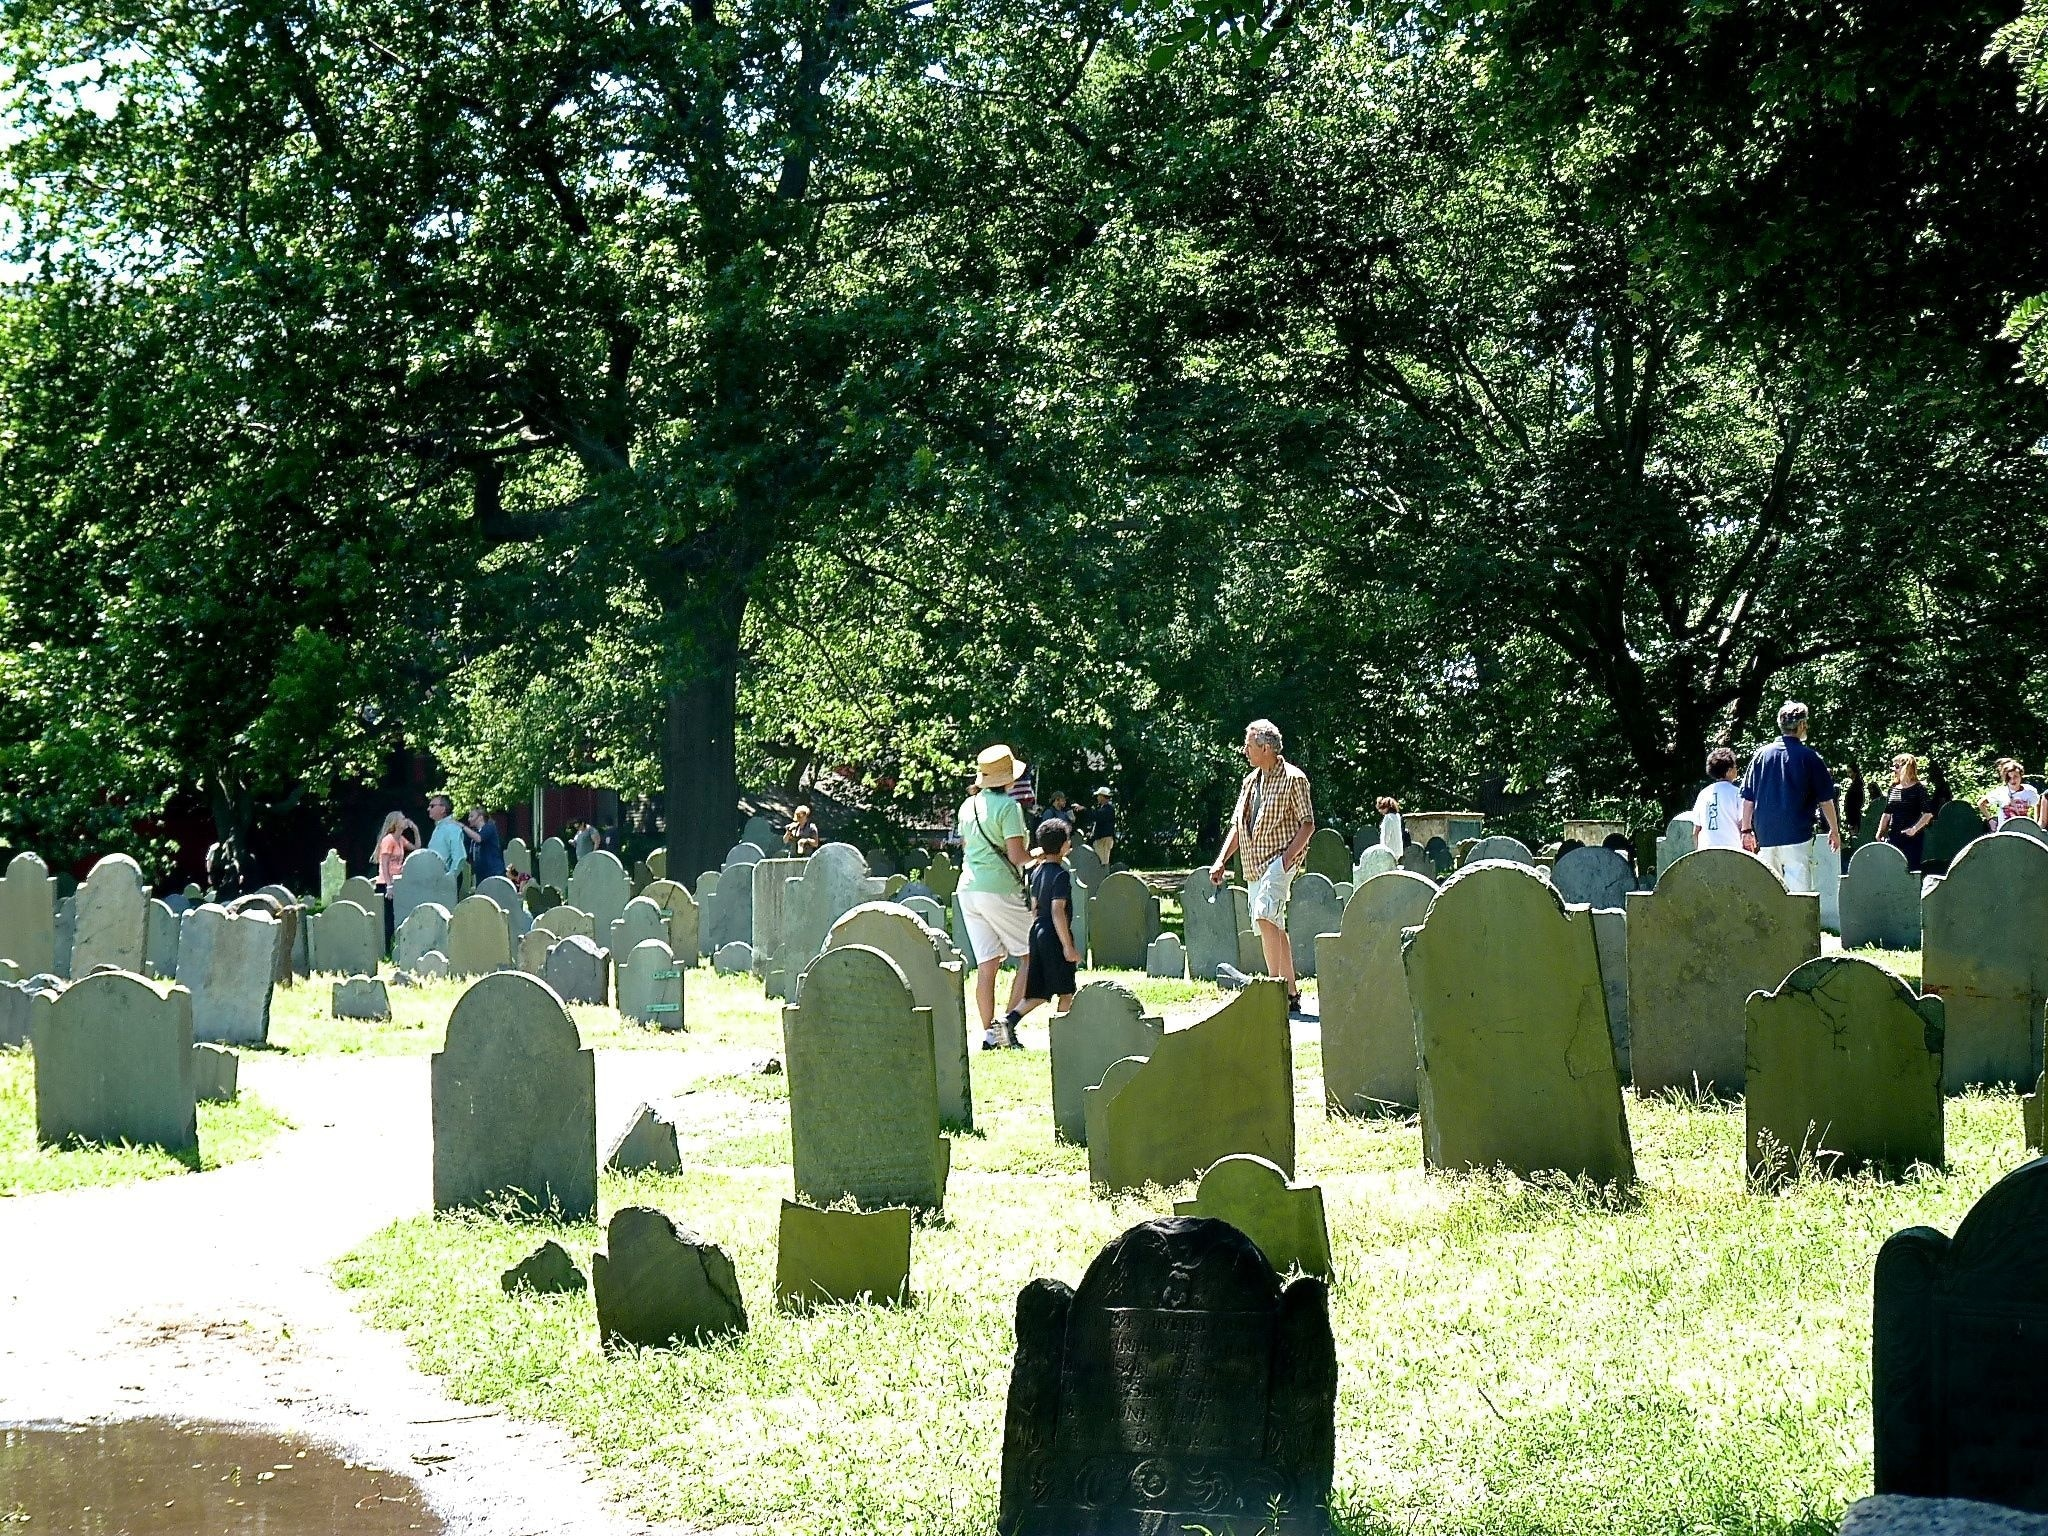 Salem Witch Trials Memorial, Salem, Massachusetts, United States of America